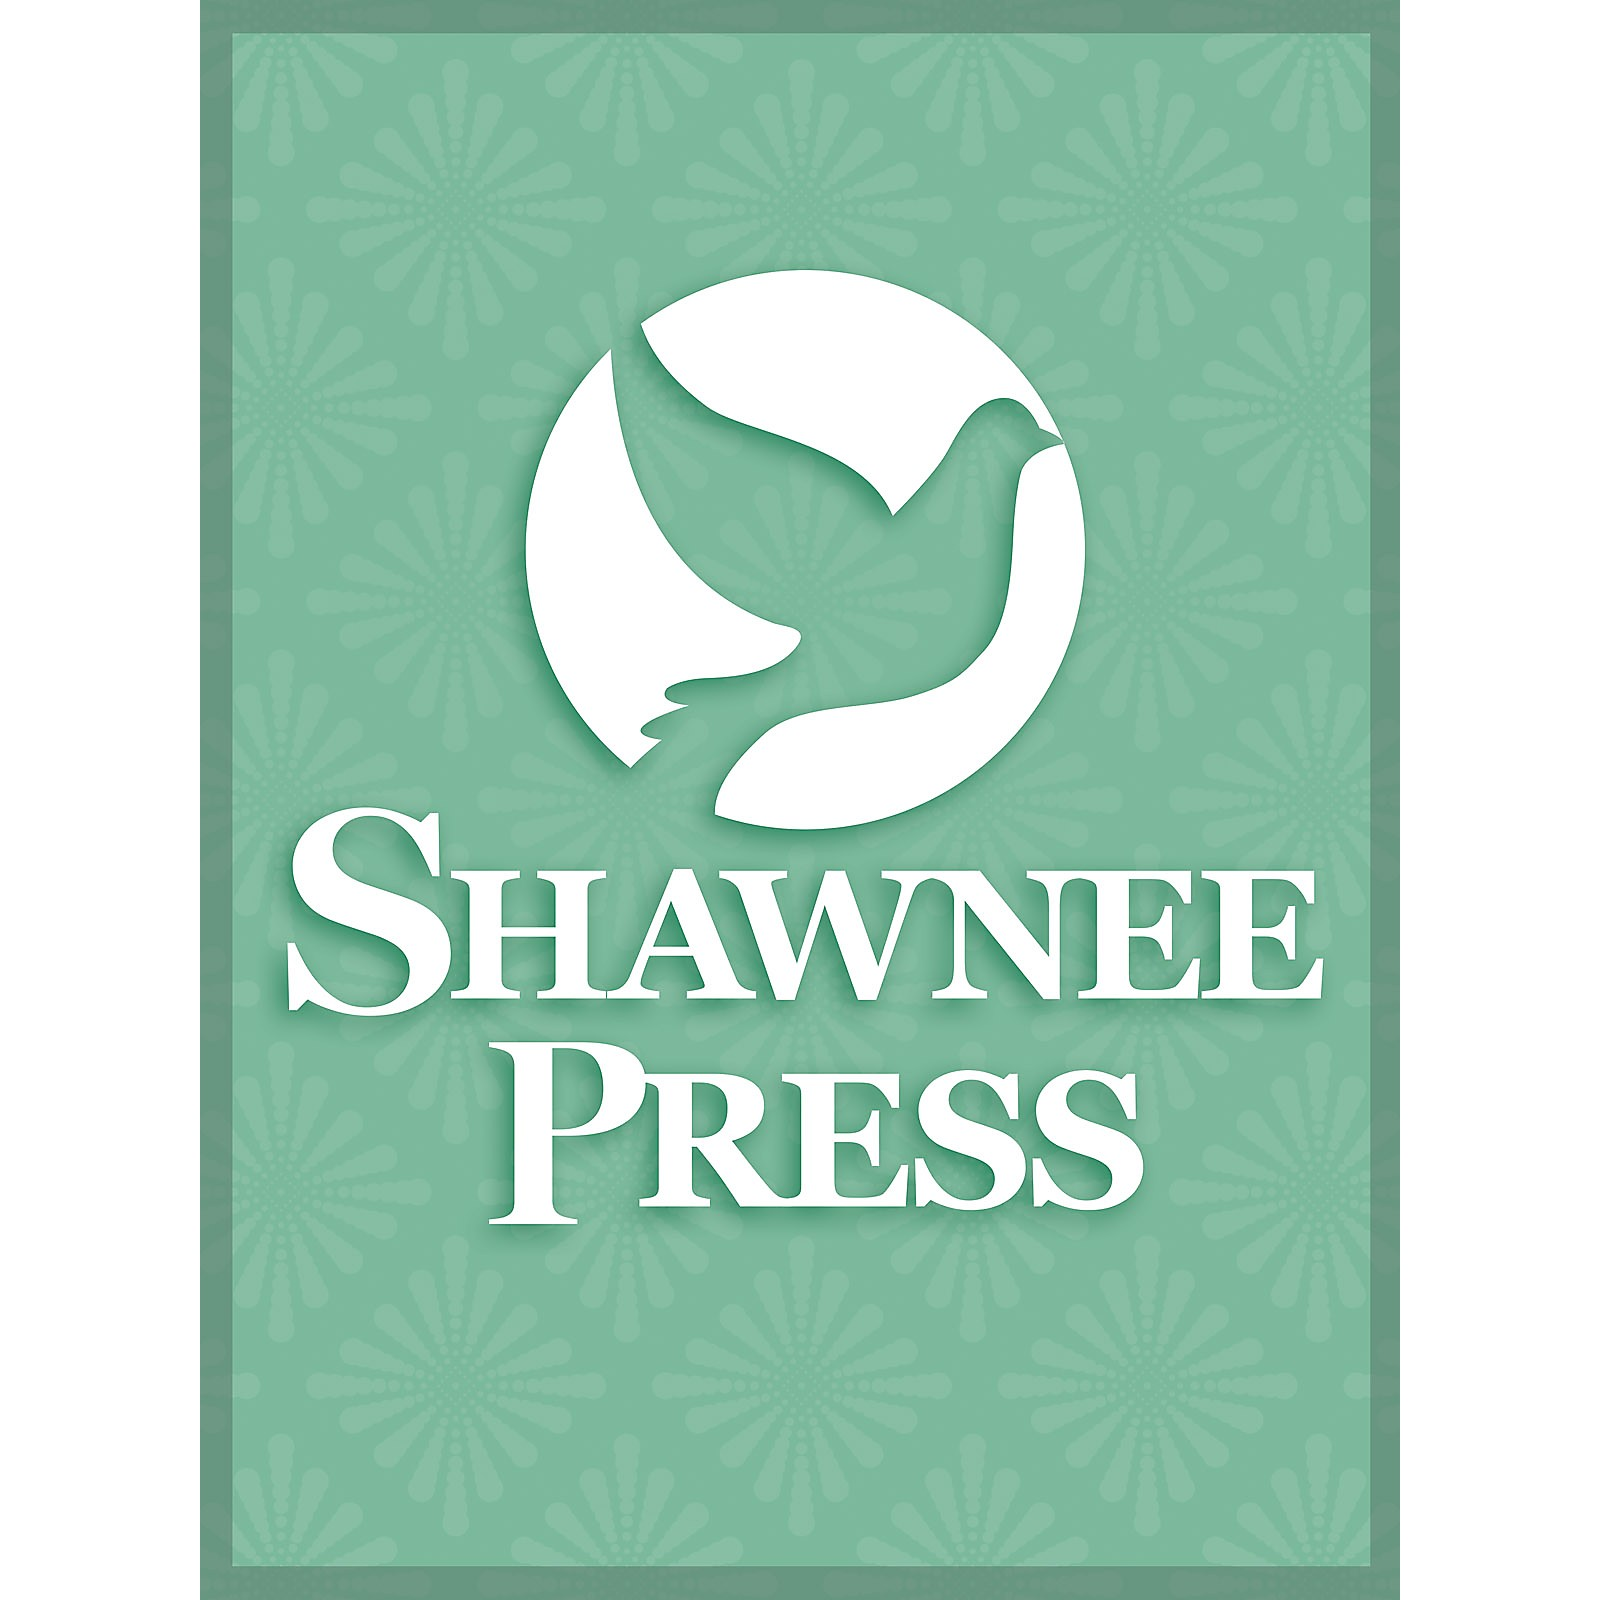 Margun Music Marimolin (Violin/Marimba) Shawnee Press Series